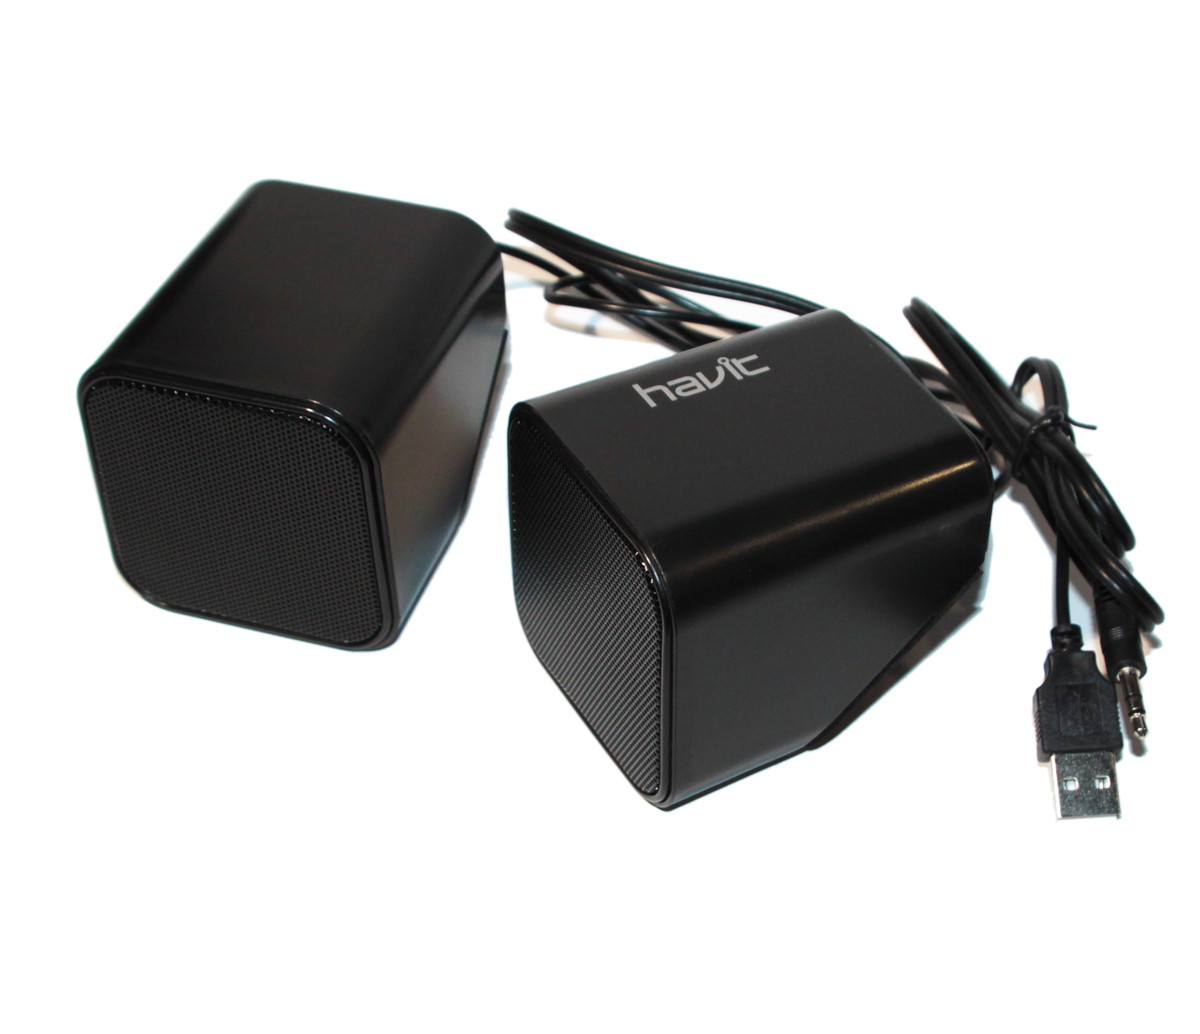 Колонки 2.0 Havit HV-SK473 Black, 2 x 3 Вт, пластиковый корпус, питани